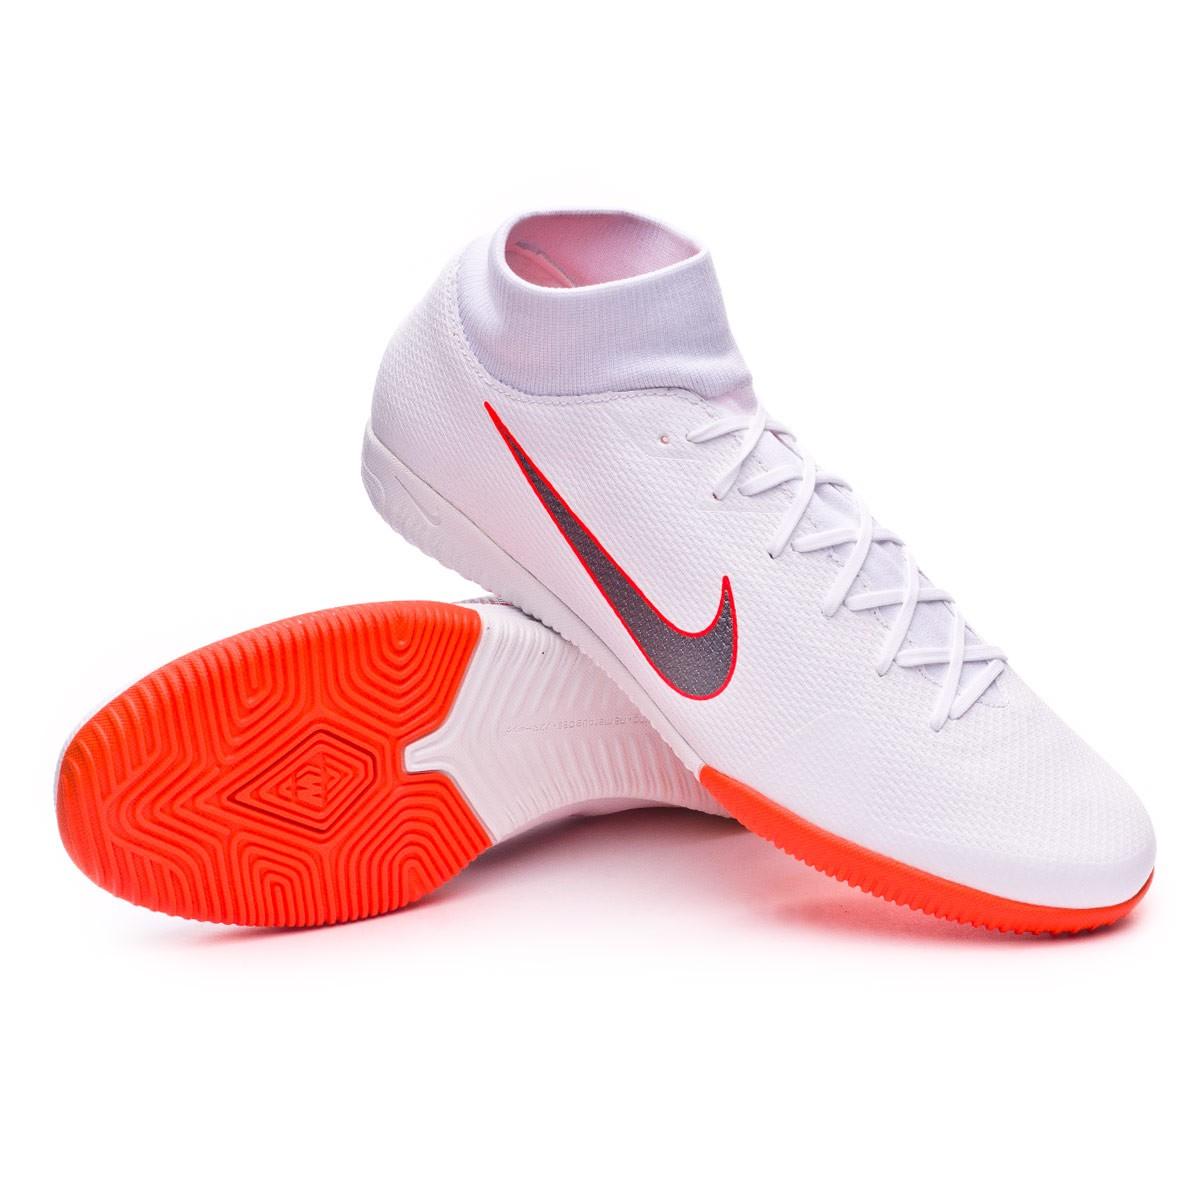 1bb6df7d2c28 Futsal Boot Nike Mercurial SuperflyX VI Academy IC White-Metallic ...